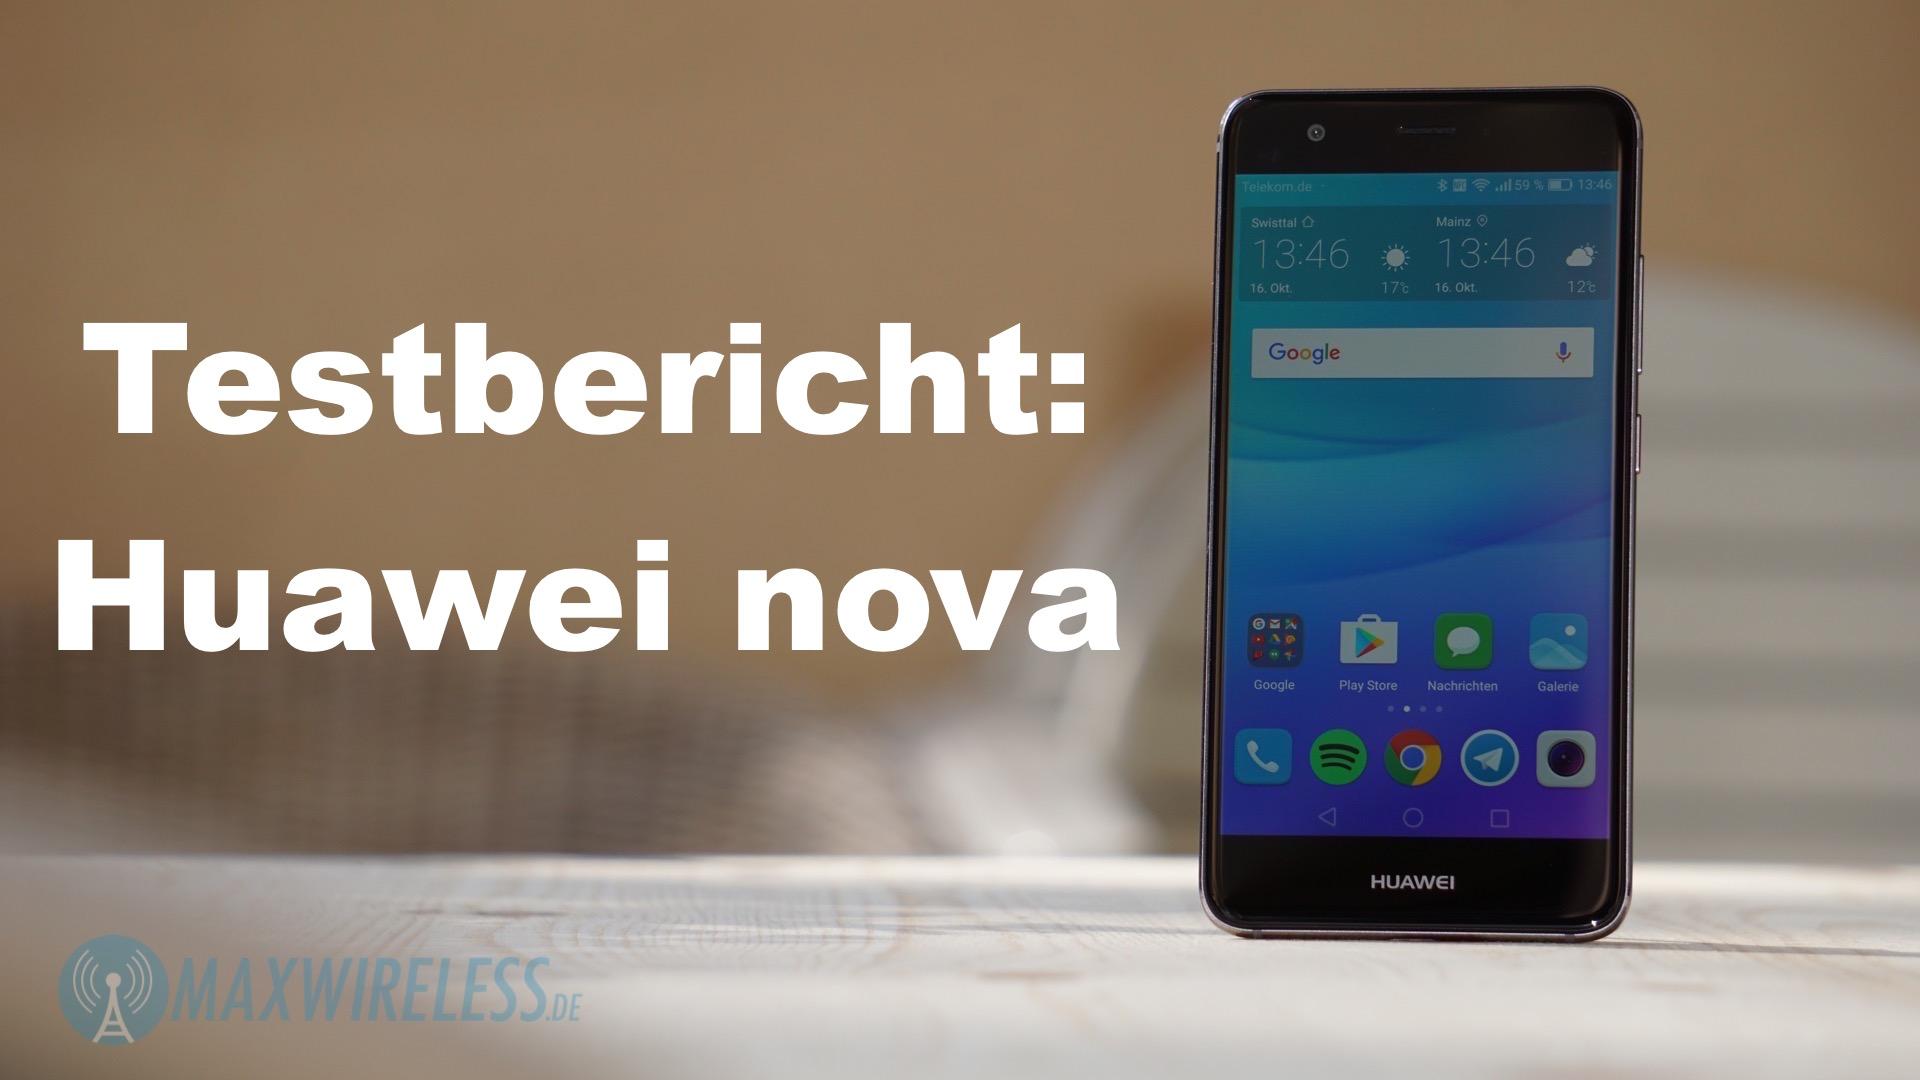 Testbericht Huawei nova